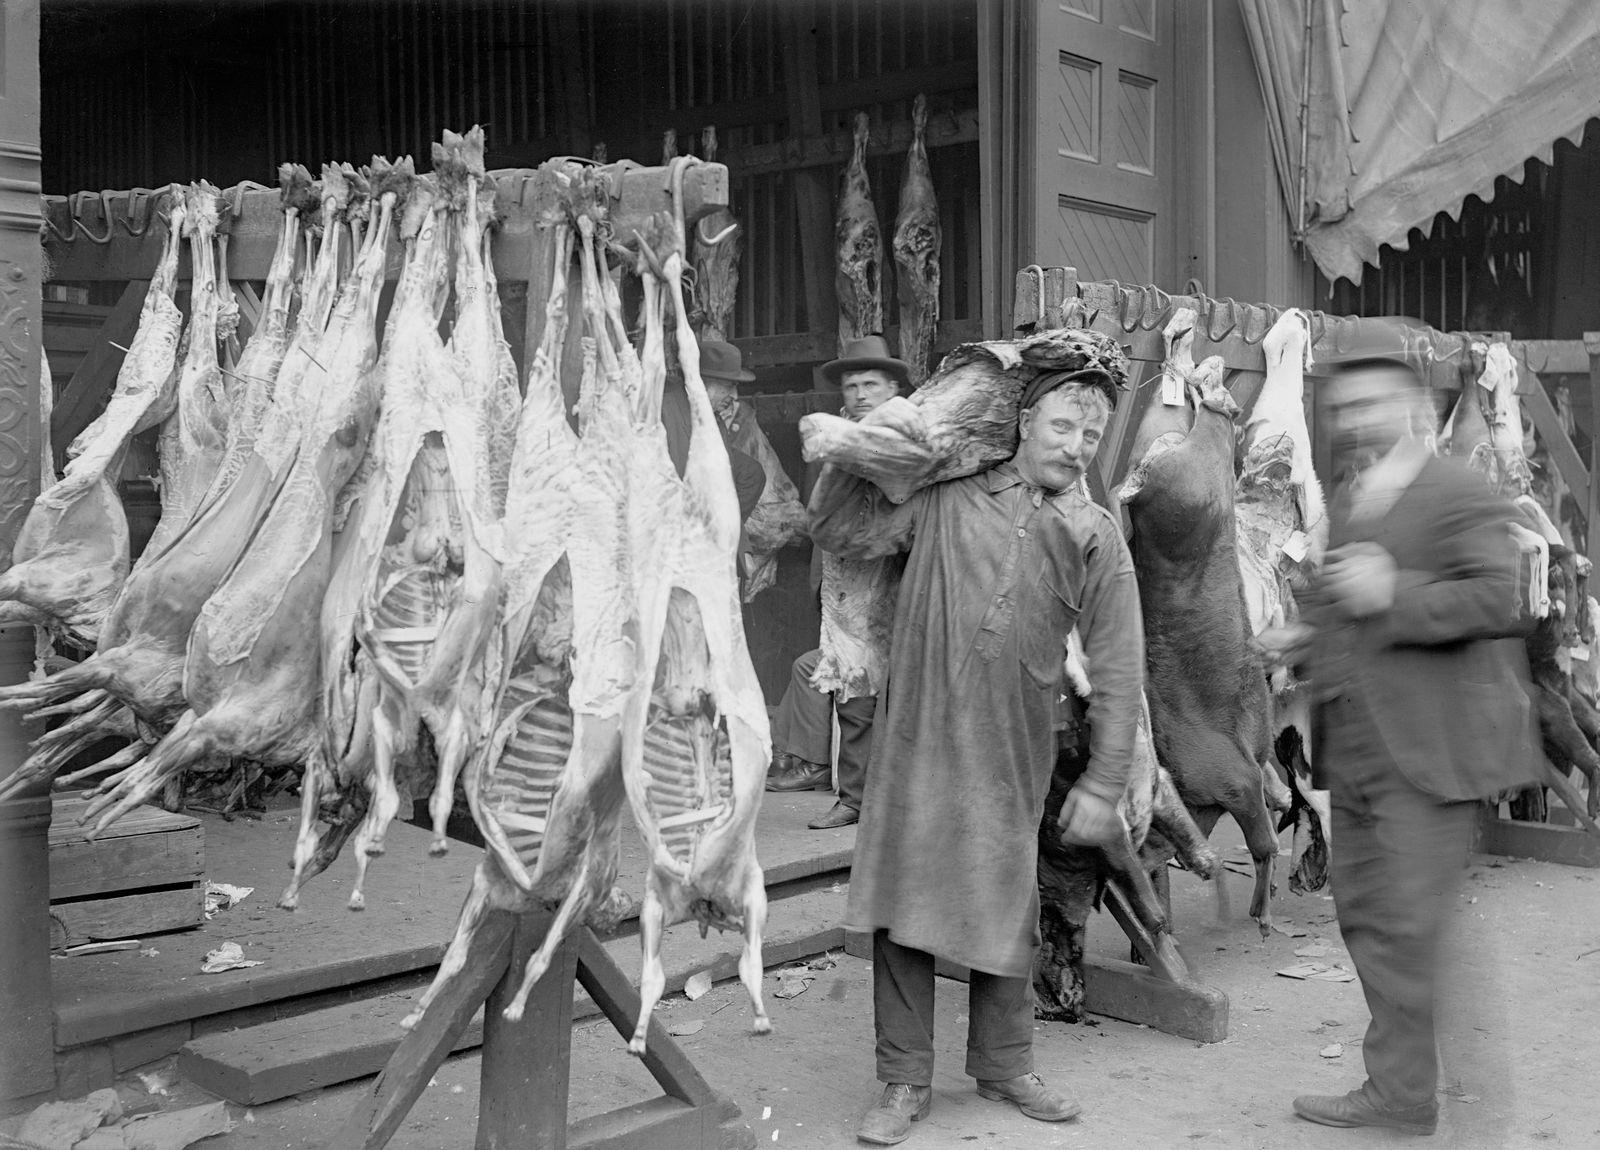 Man Beside Carcasses During The 1904 Stockyards Strike